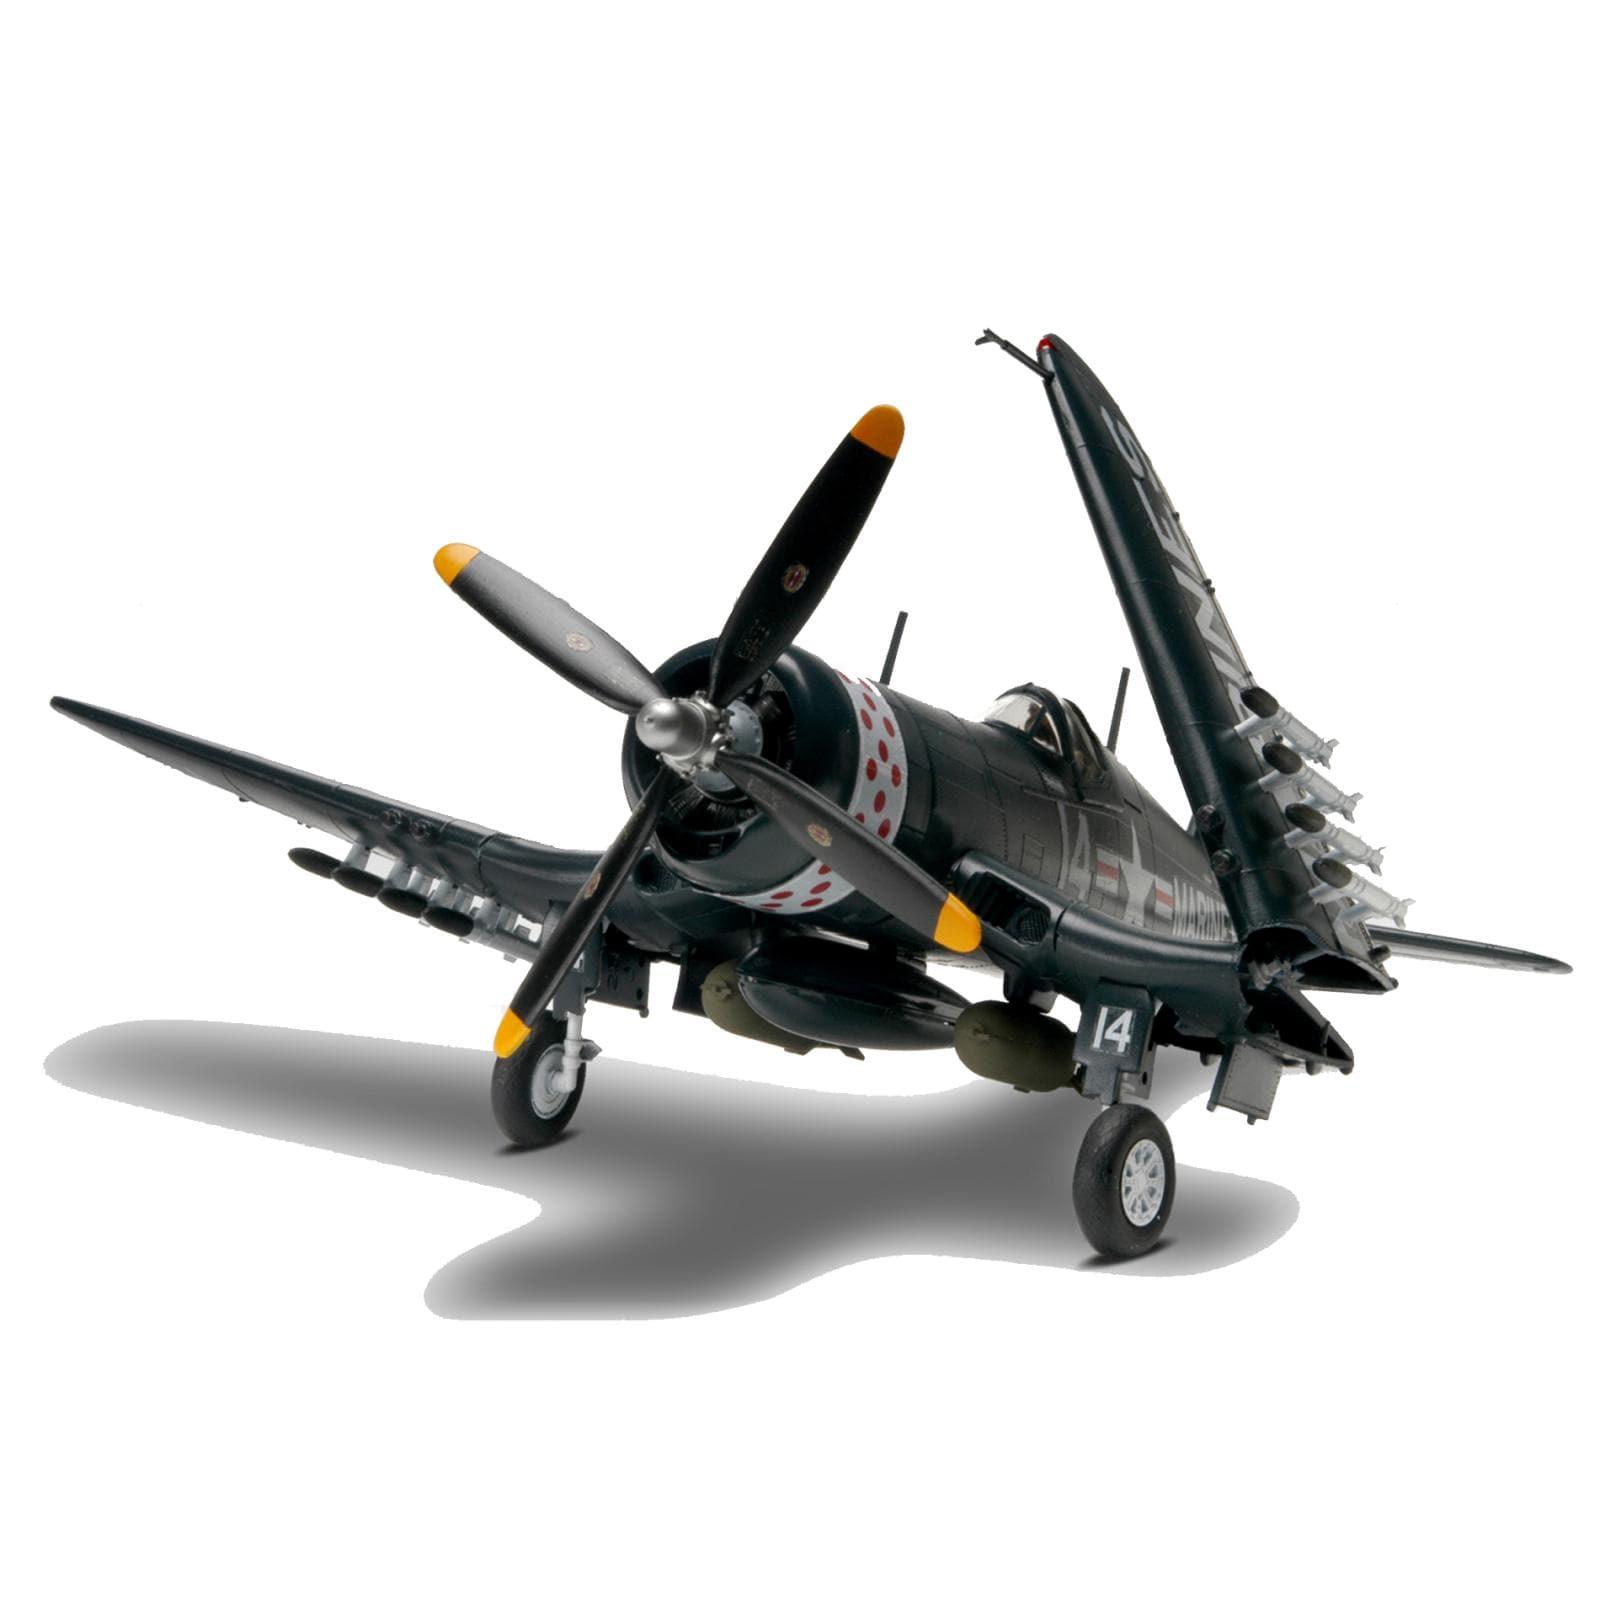 Revell 1:48 Scale Corsair F4U-4